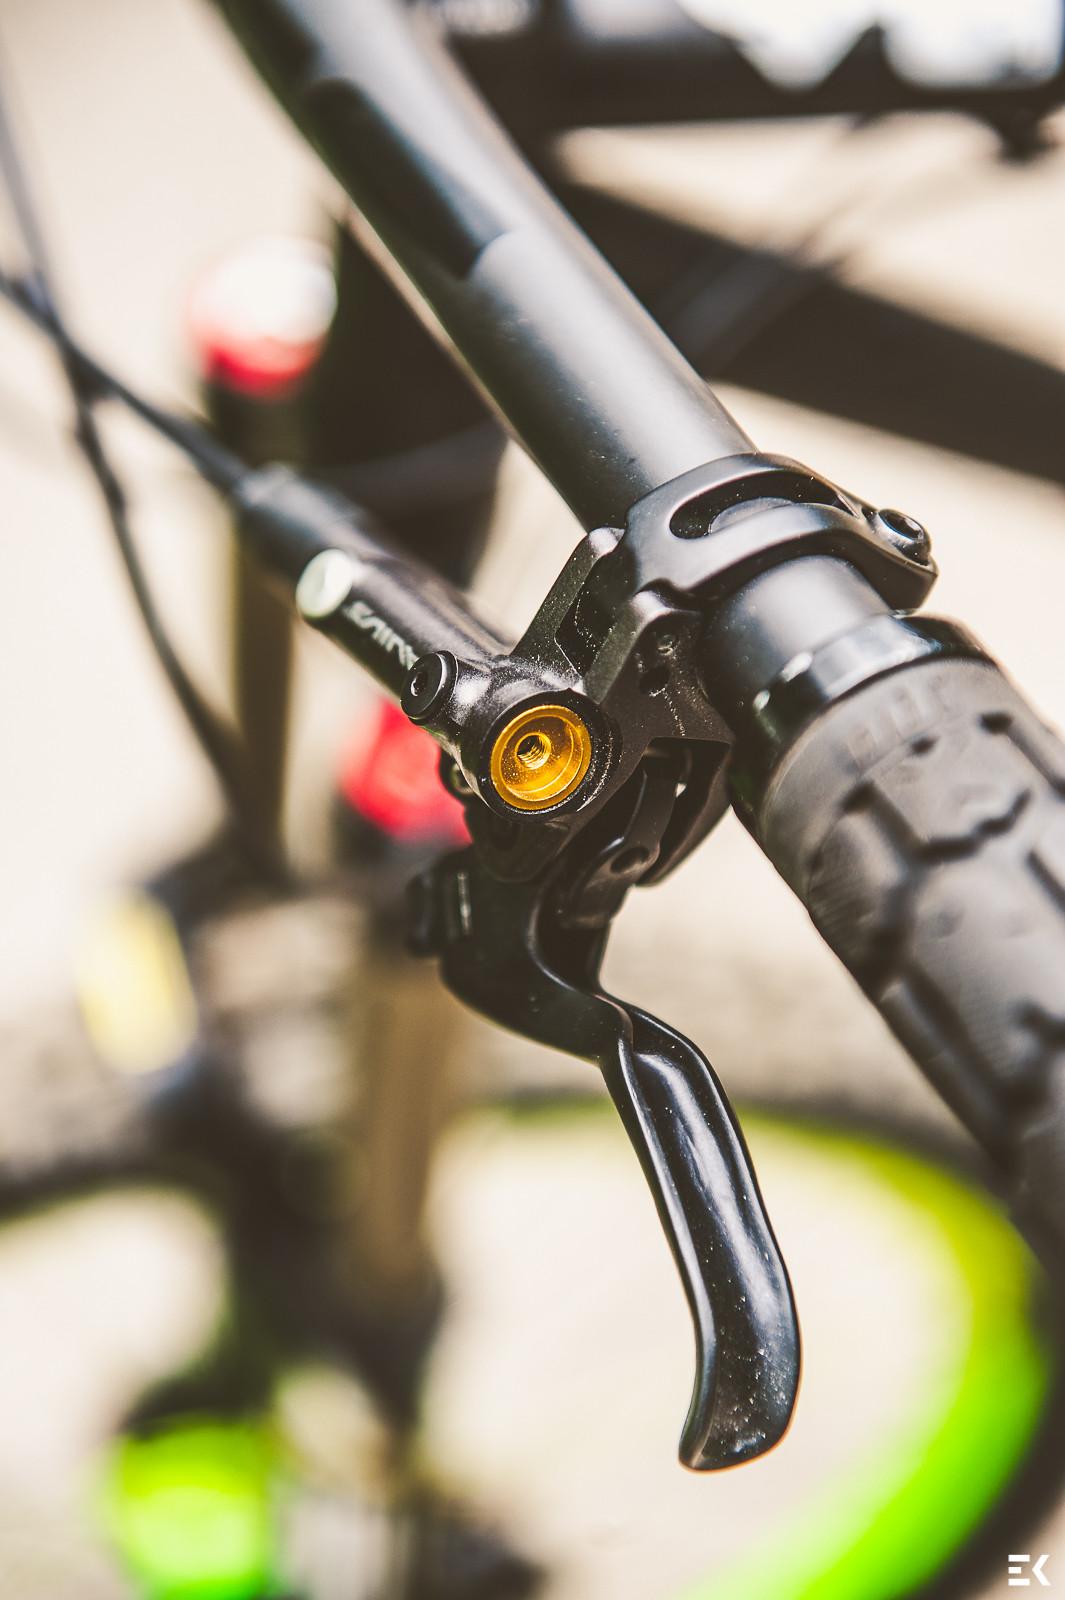 ns surge evo 2017   bos deville fcv - banan u0026 39 s bike check